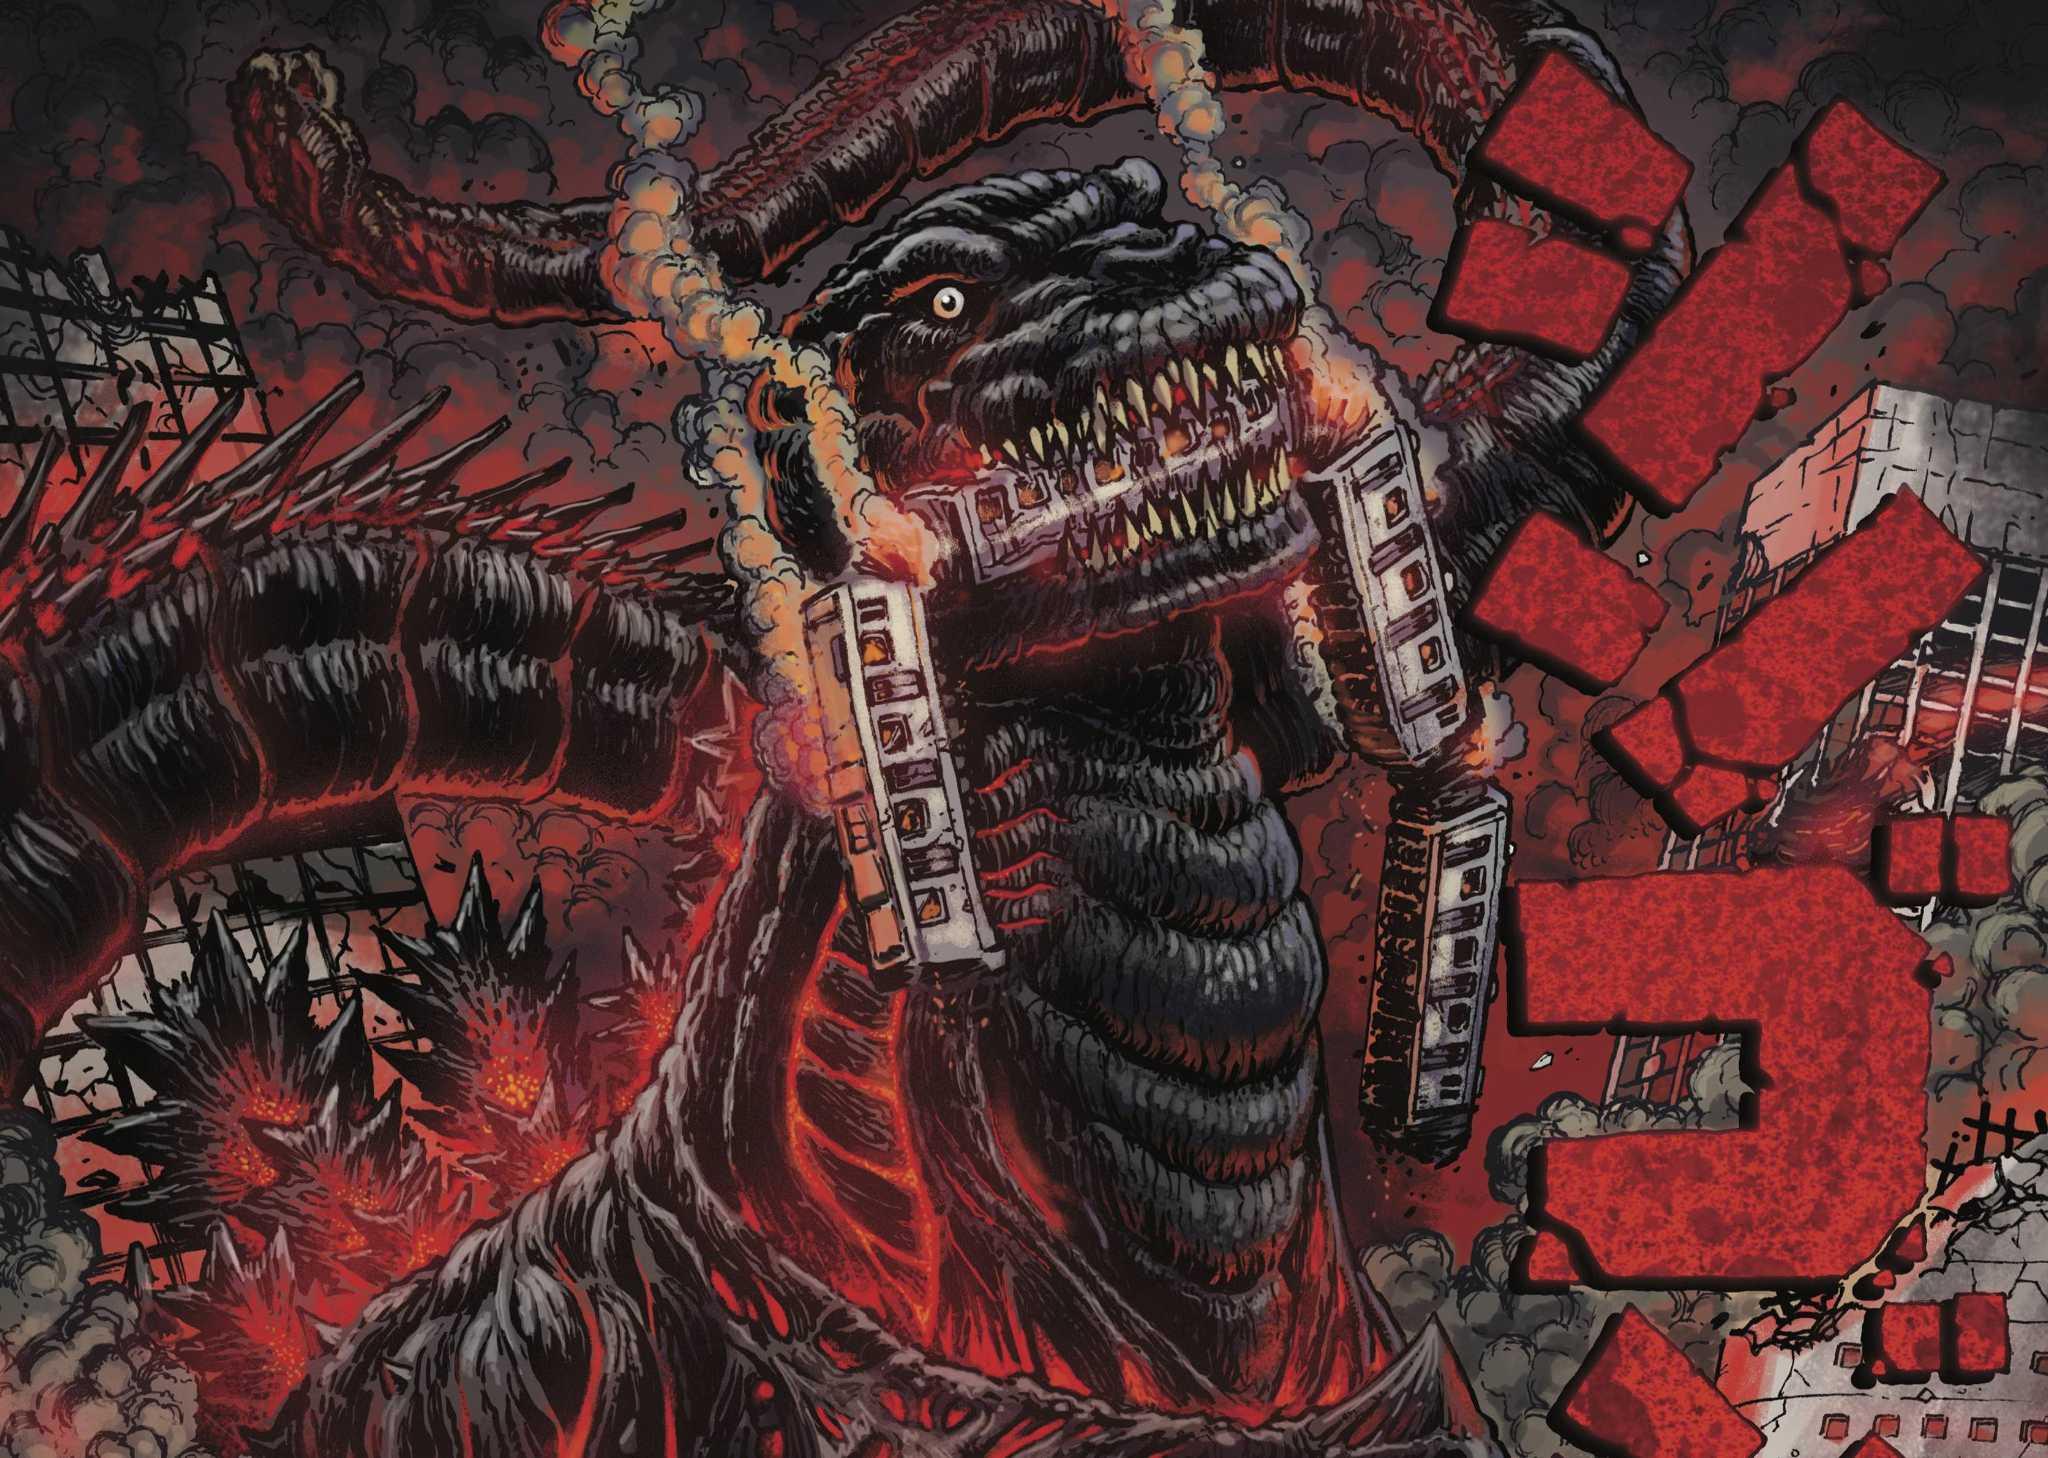 Exclusive Shin Godzilla Poster By San Antonio Artist